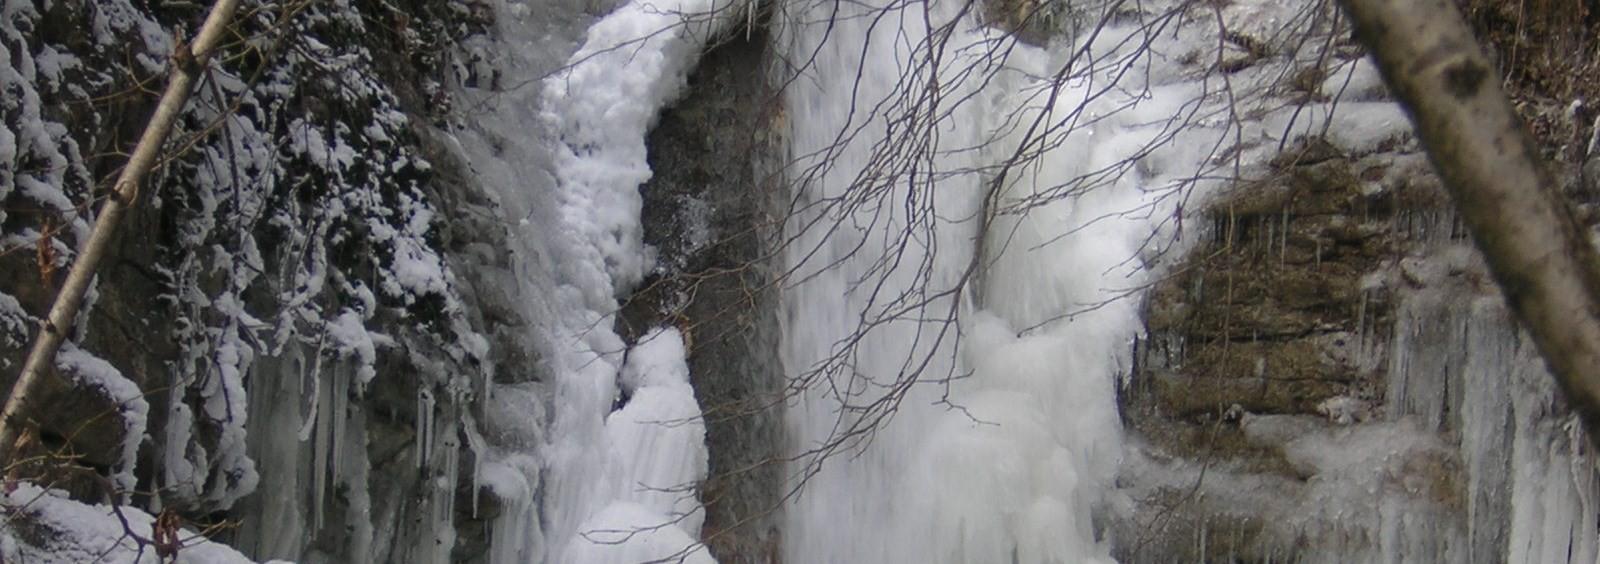 cascade-de-craponoz-inpixio-1504